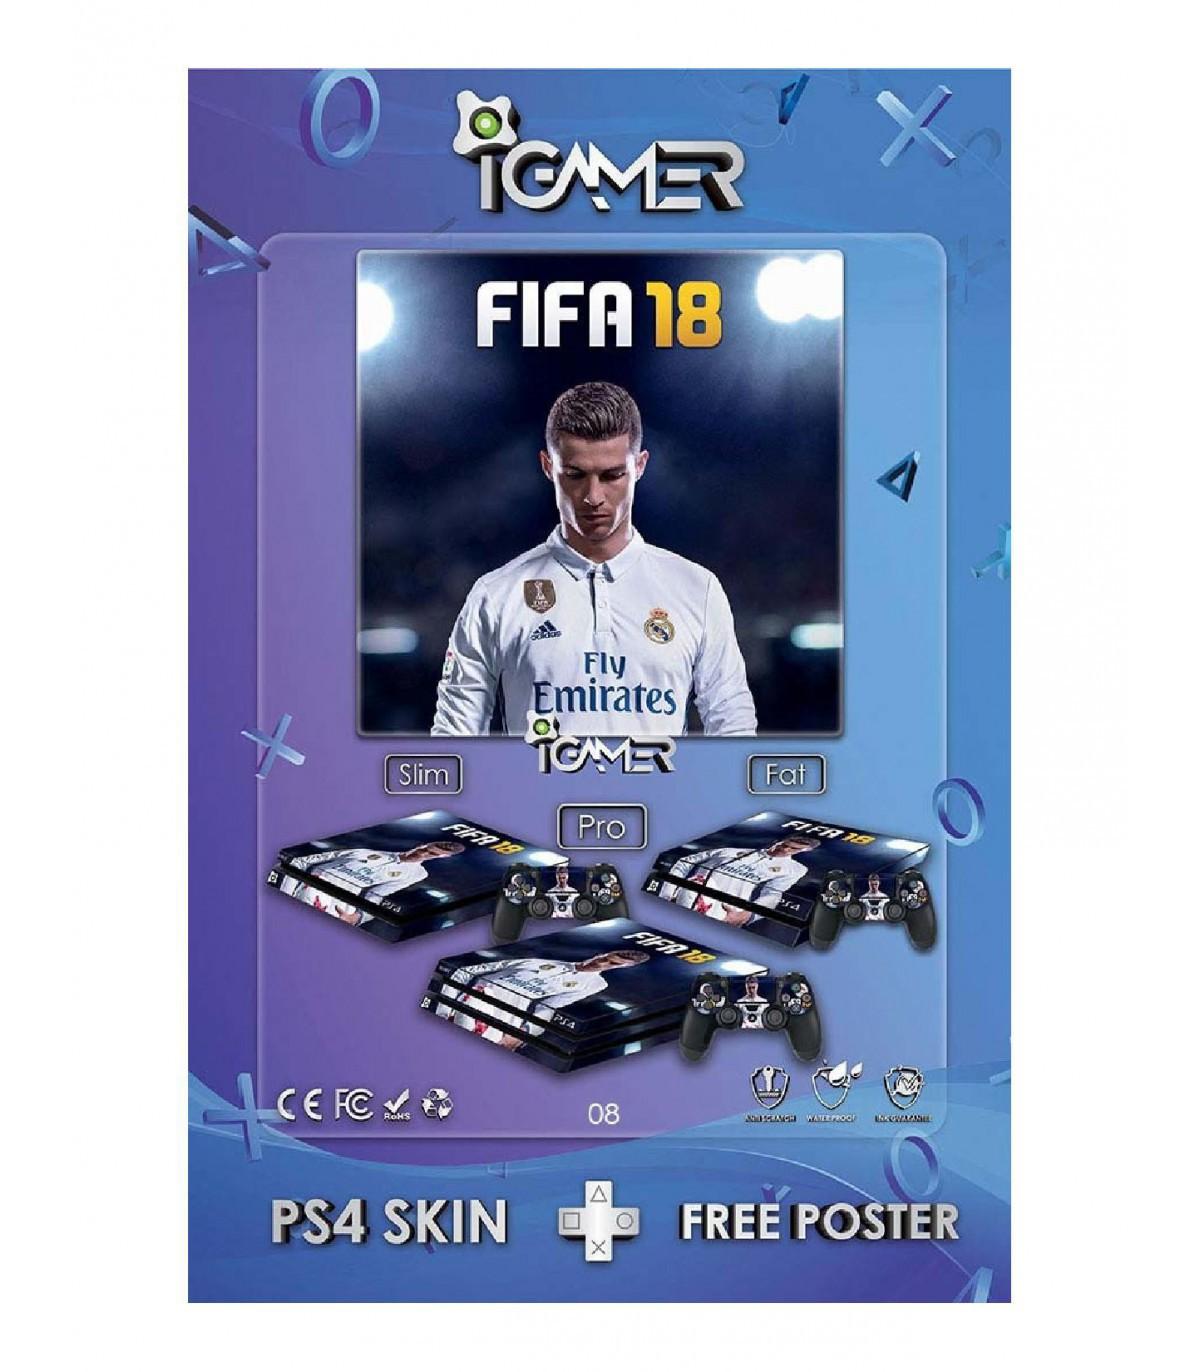 اسکین PS4 اسلیم طرح FIFA18